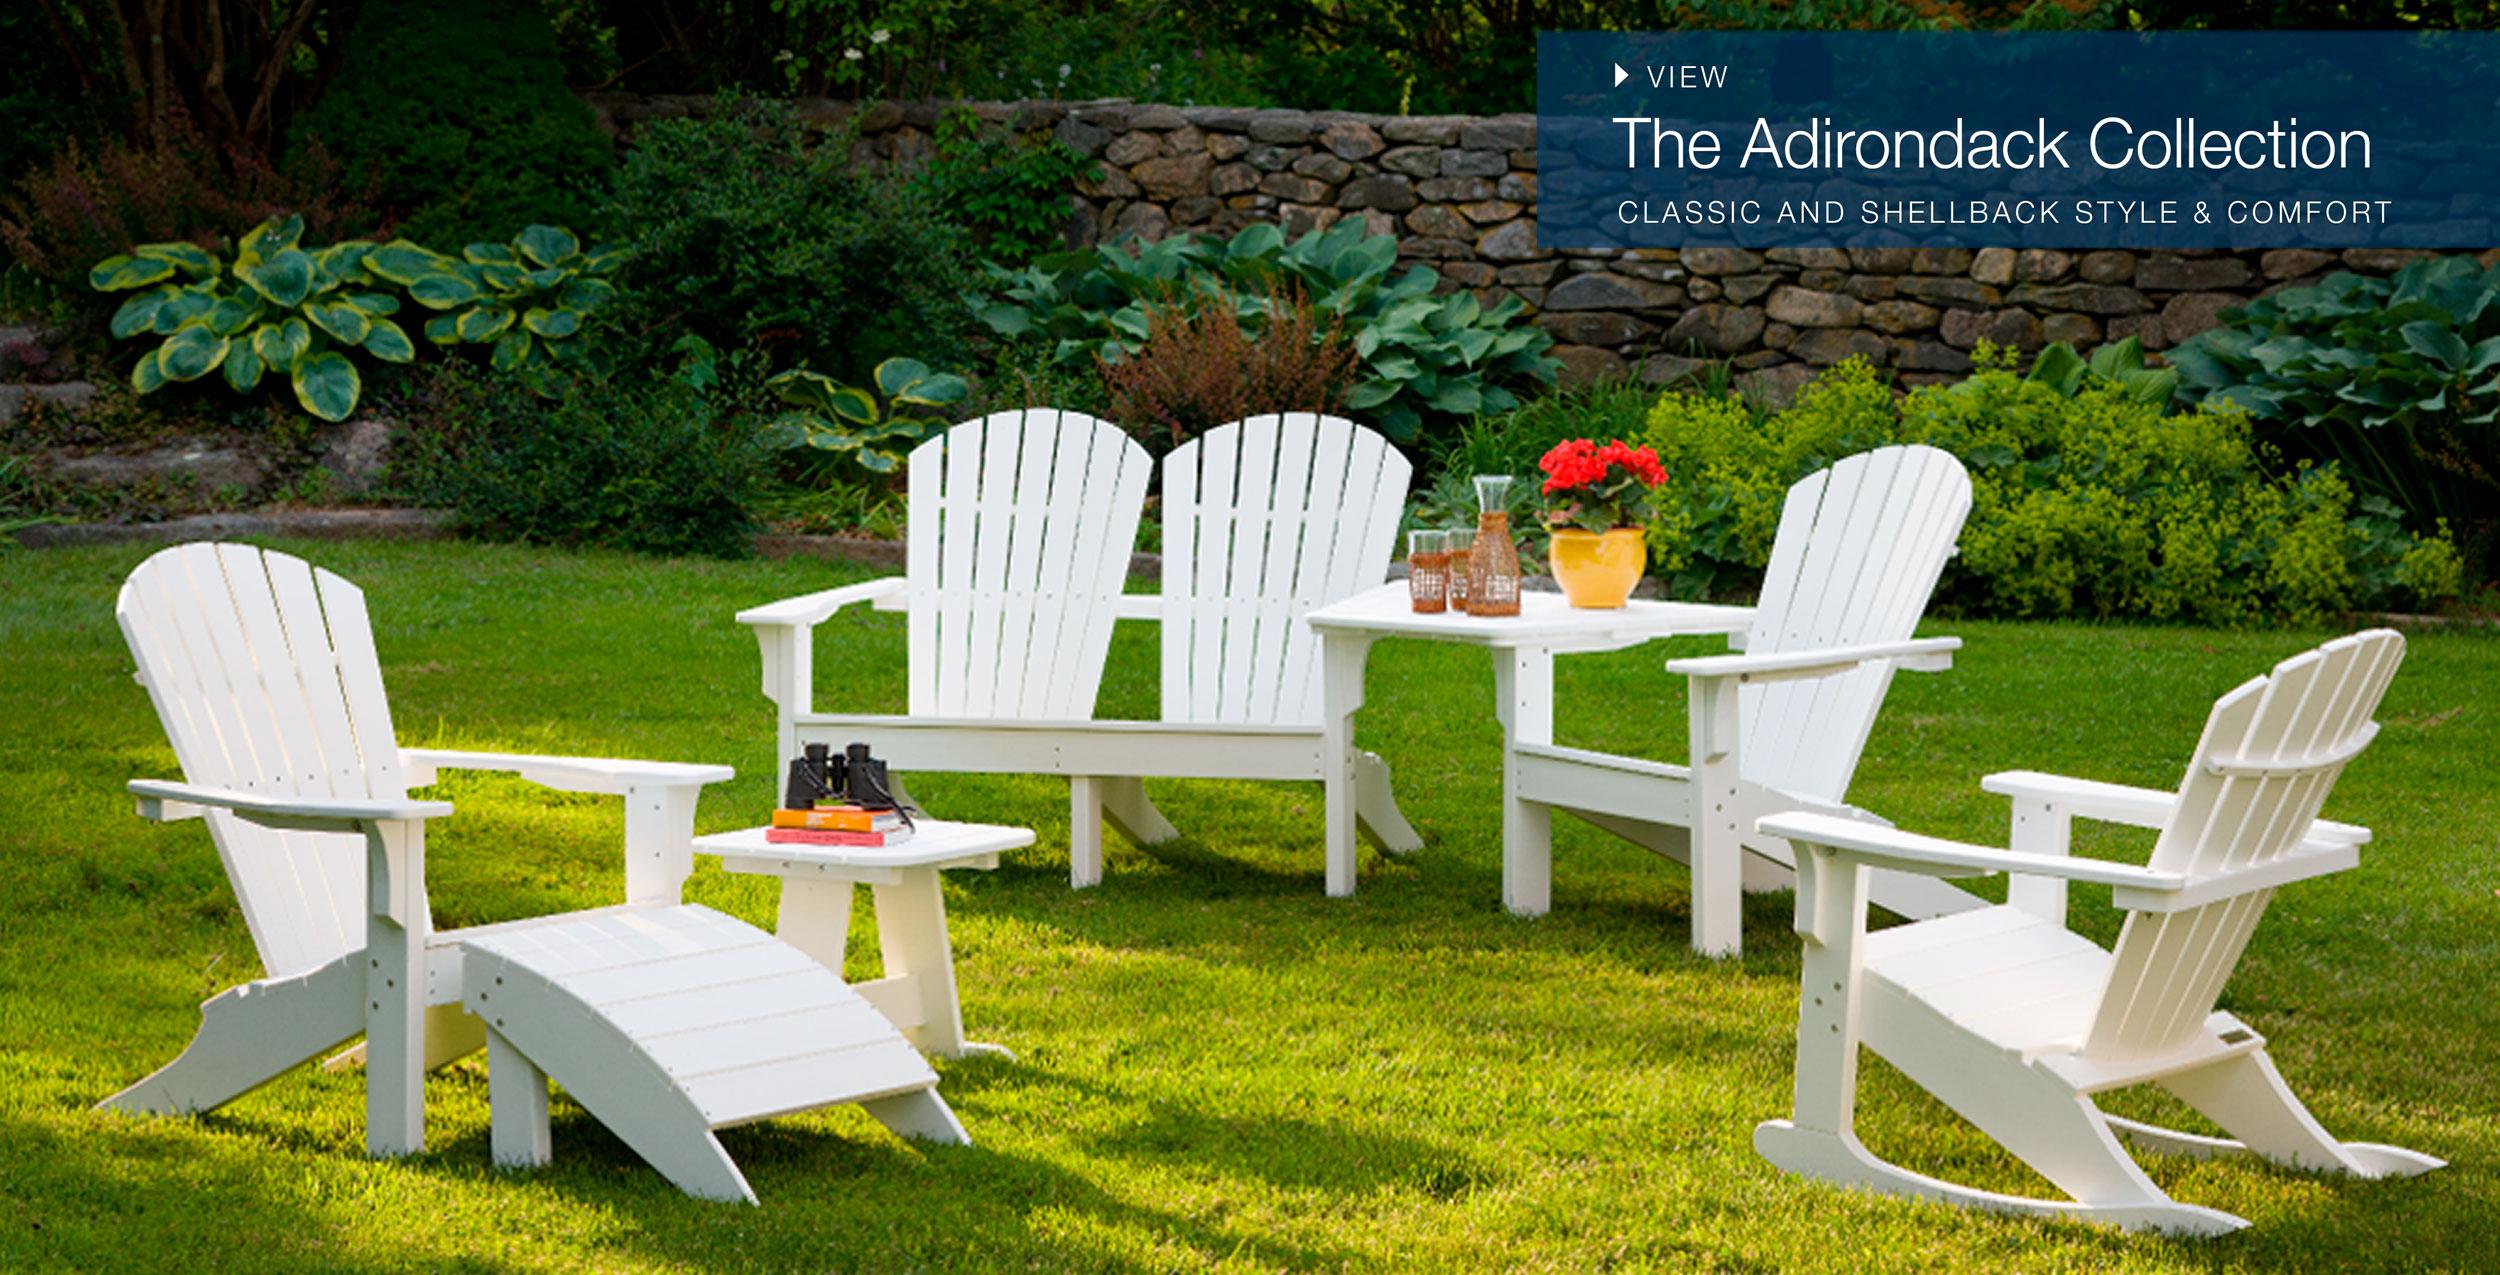 folding lawn chairs ontario fabric oak dining welcome seaside casual furniture adirondack classic collectio